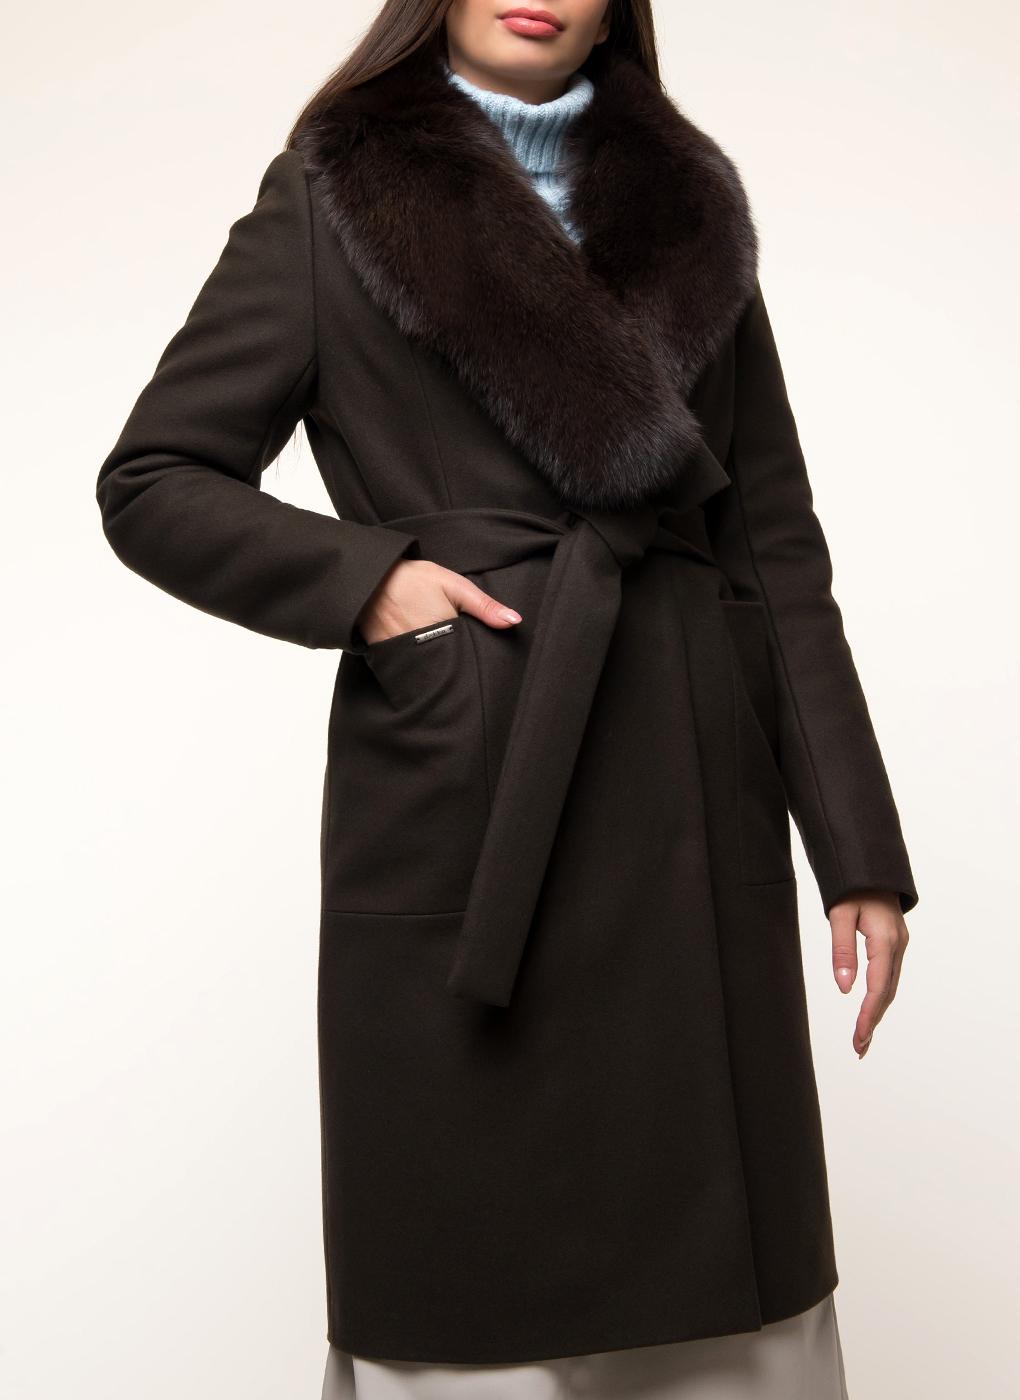 Пальто прямое шерстяное 54, idekka